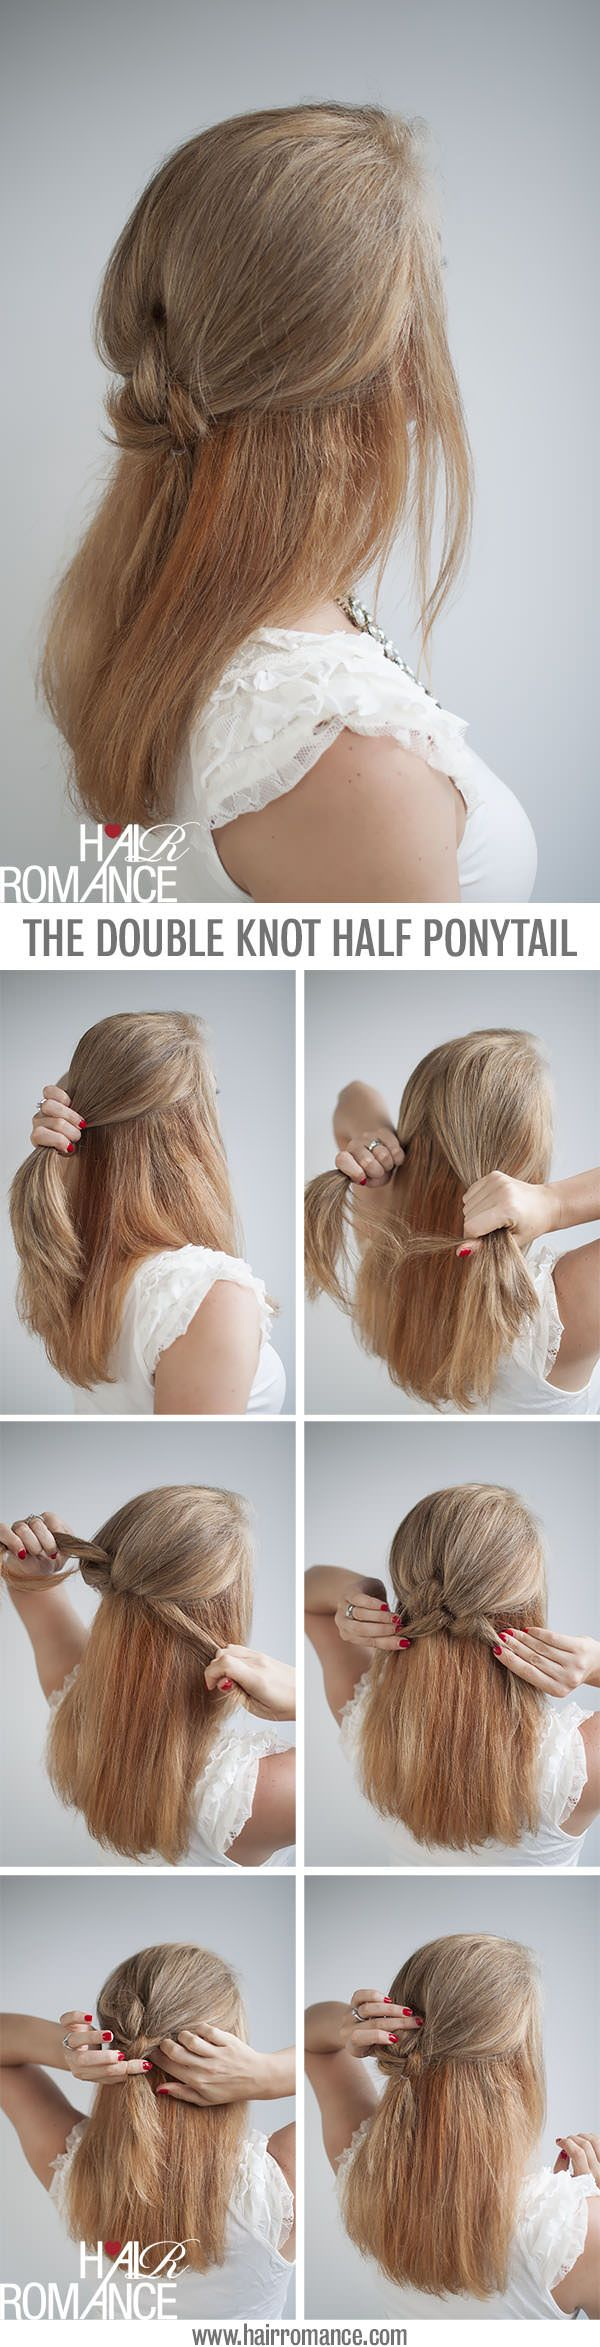 Knot Your Average Half Pontytail